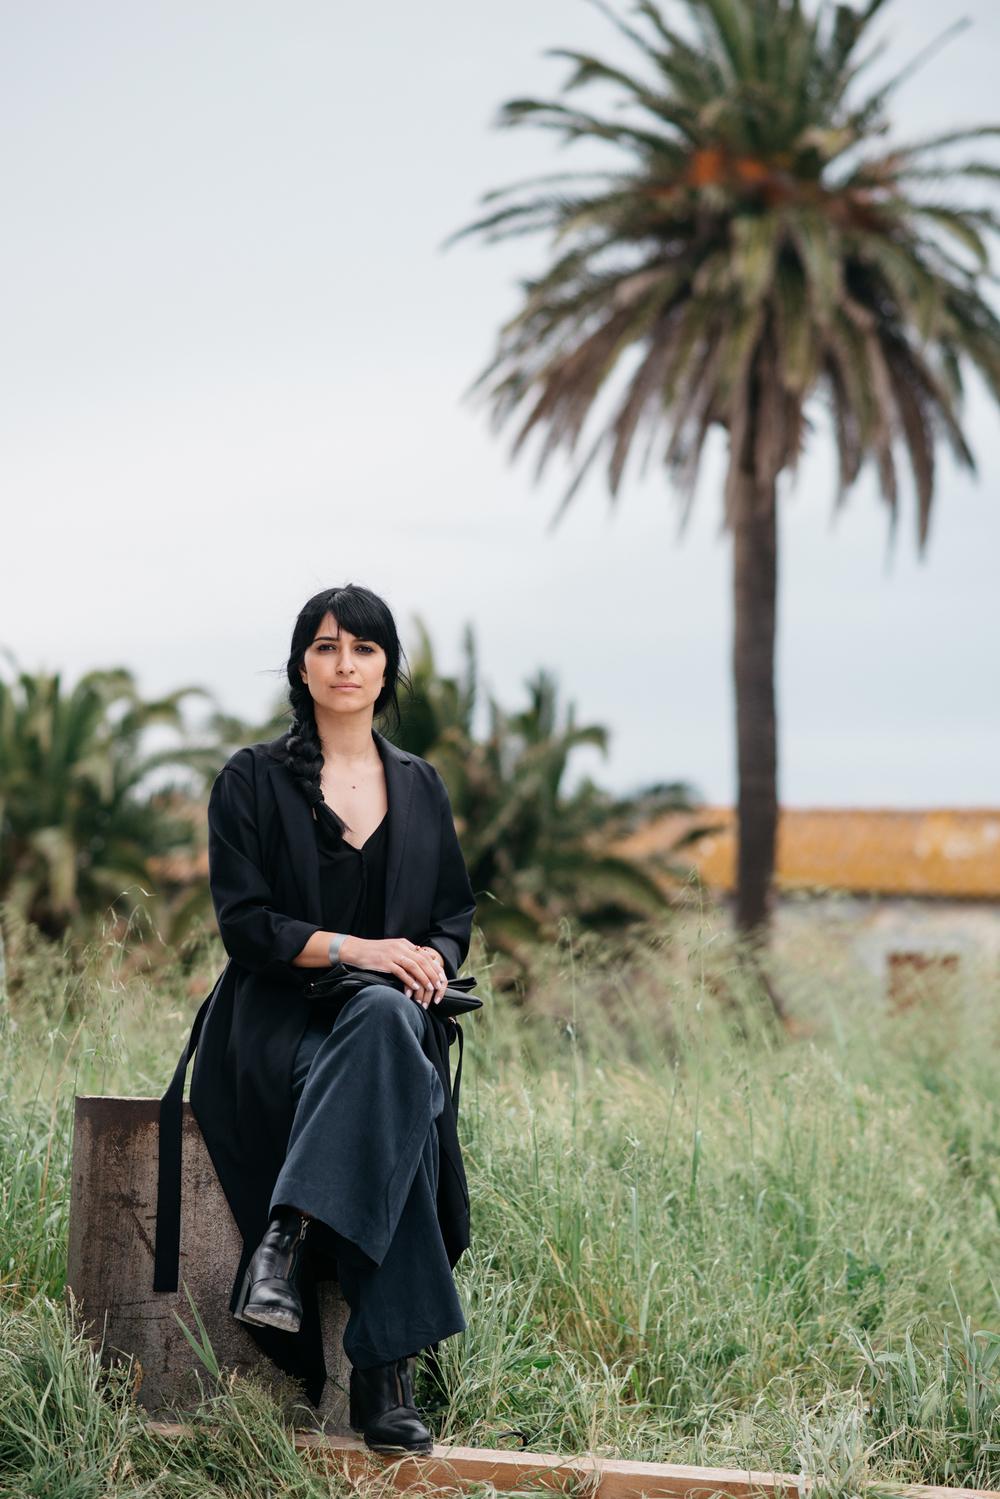 Samira Heravi